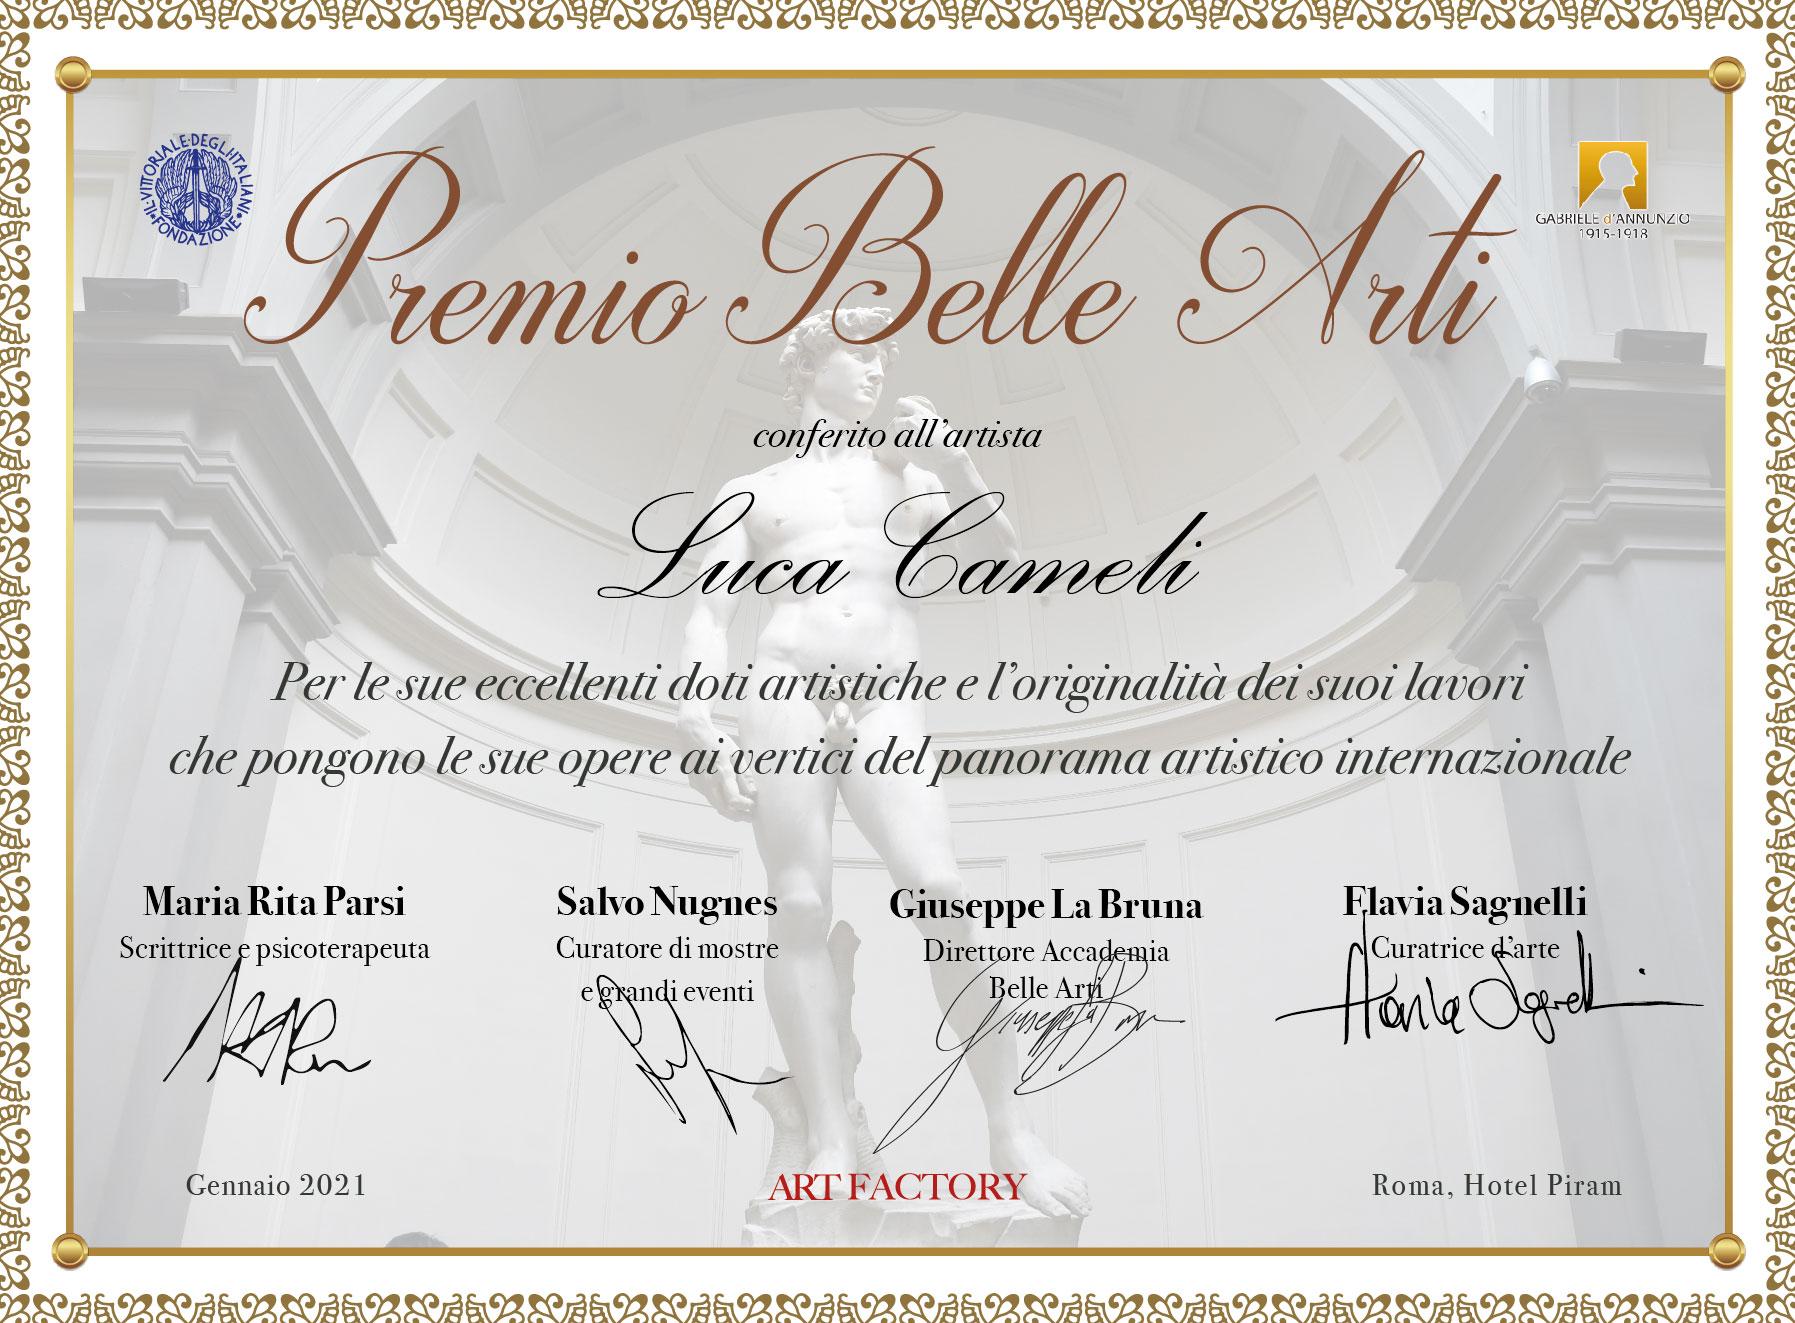 """Premio Belle Arti 2021"" - Luca Cameli ~ ""Trieste Paint It Black"""